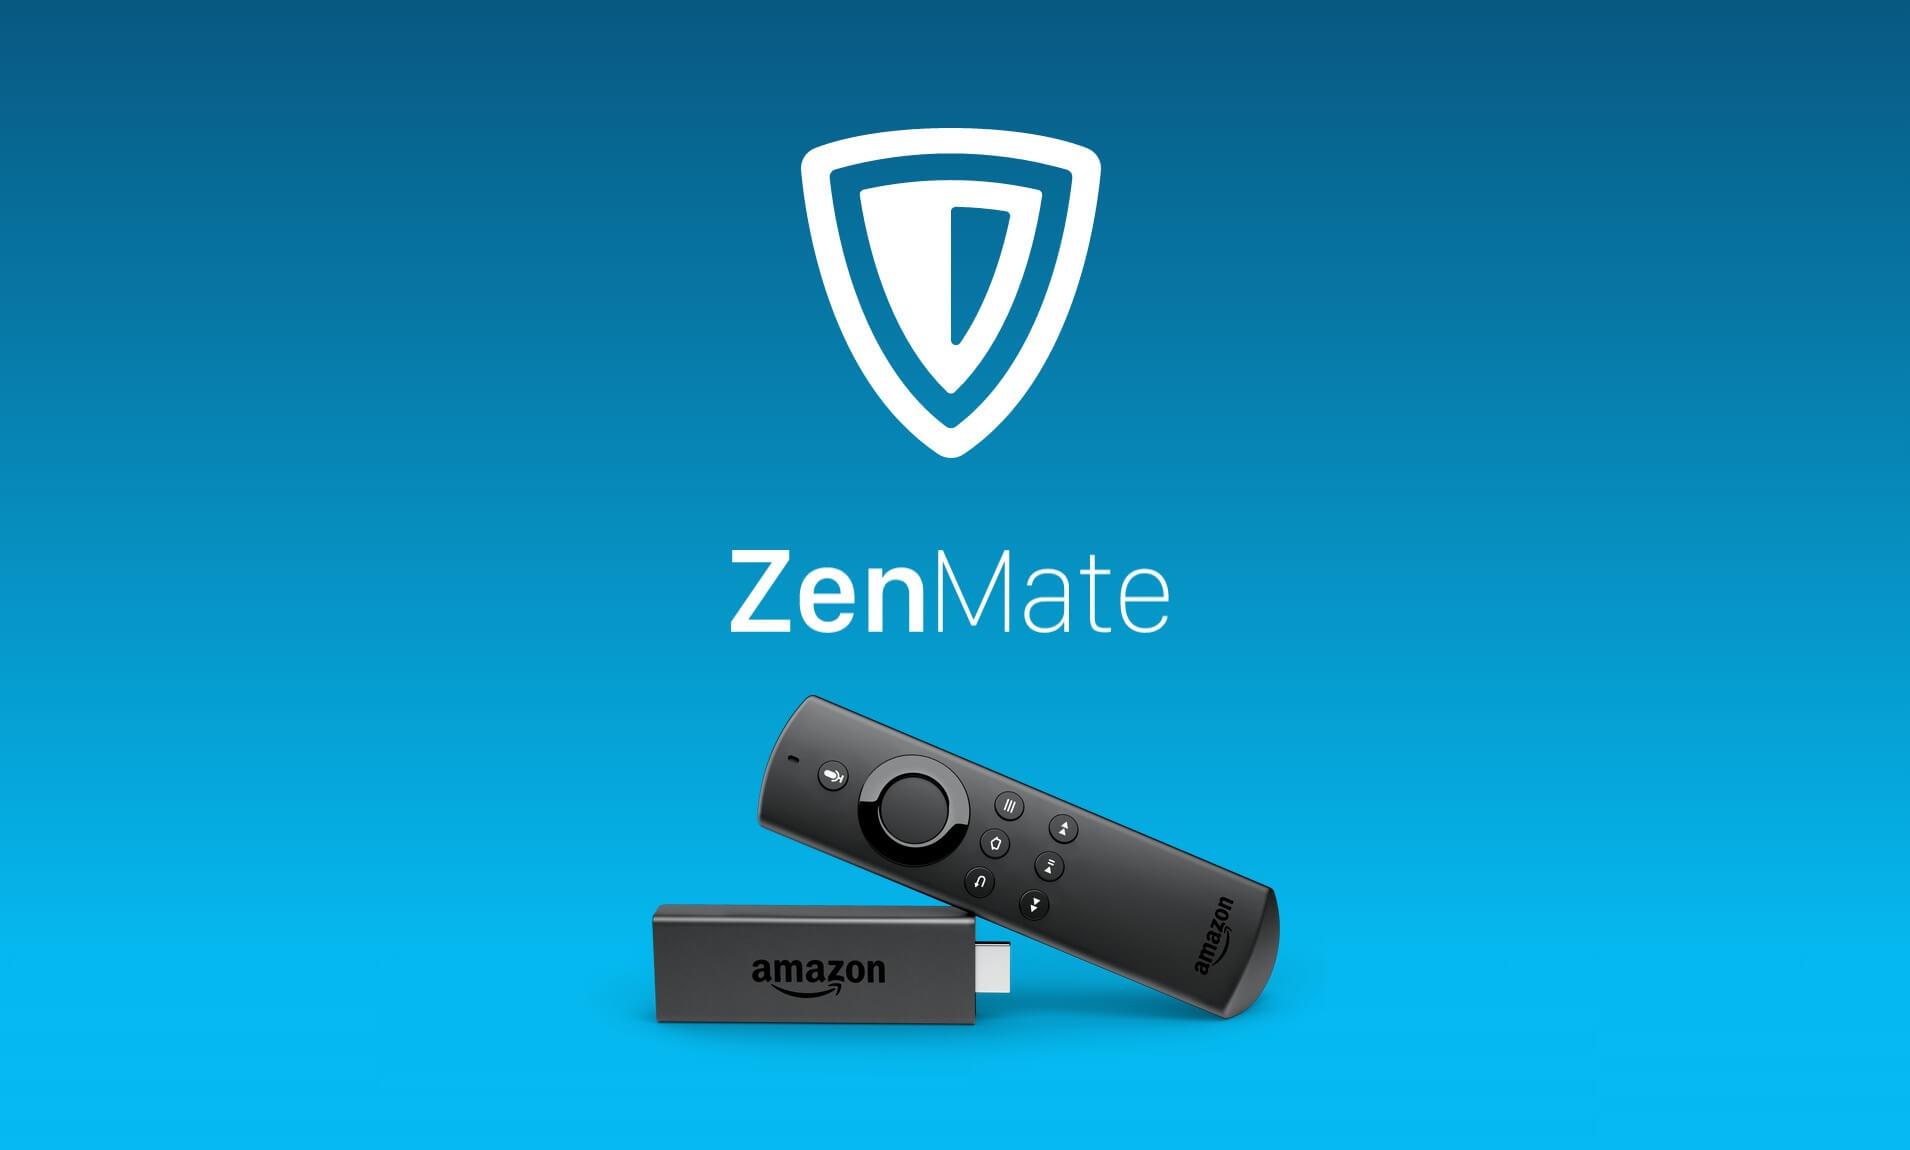 Zenmate VPN for Firestick